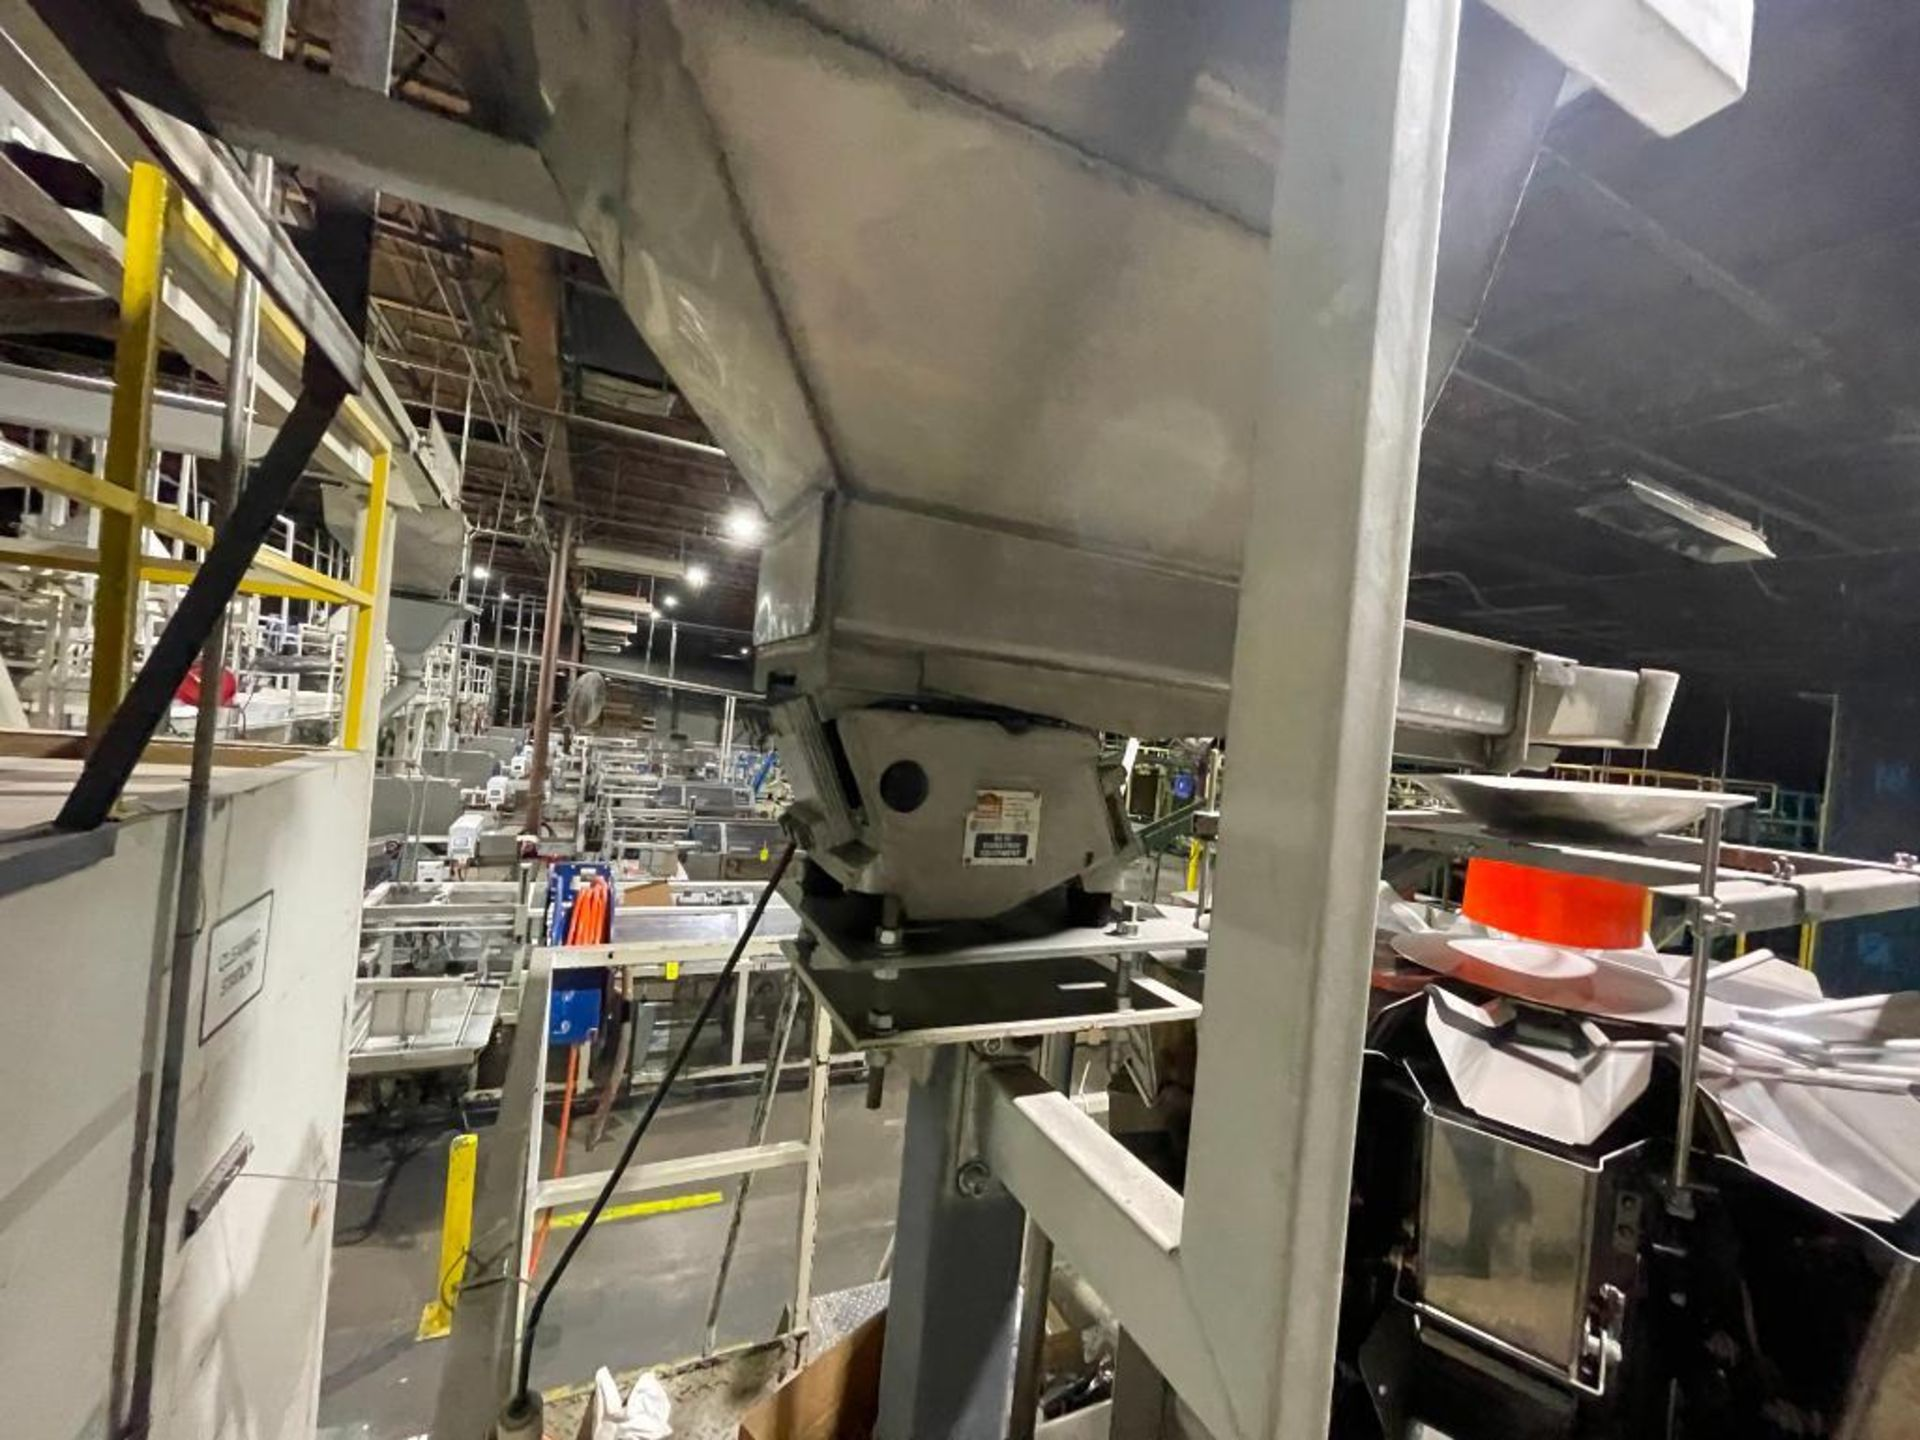 Eriez vibratory conveyor - Image 5 of 12